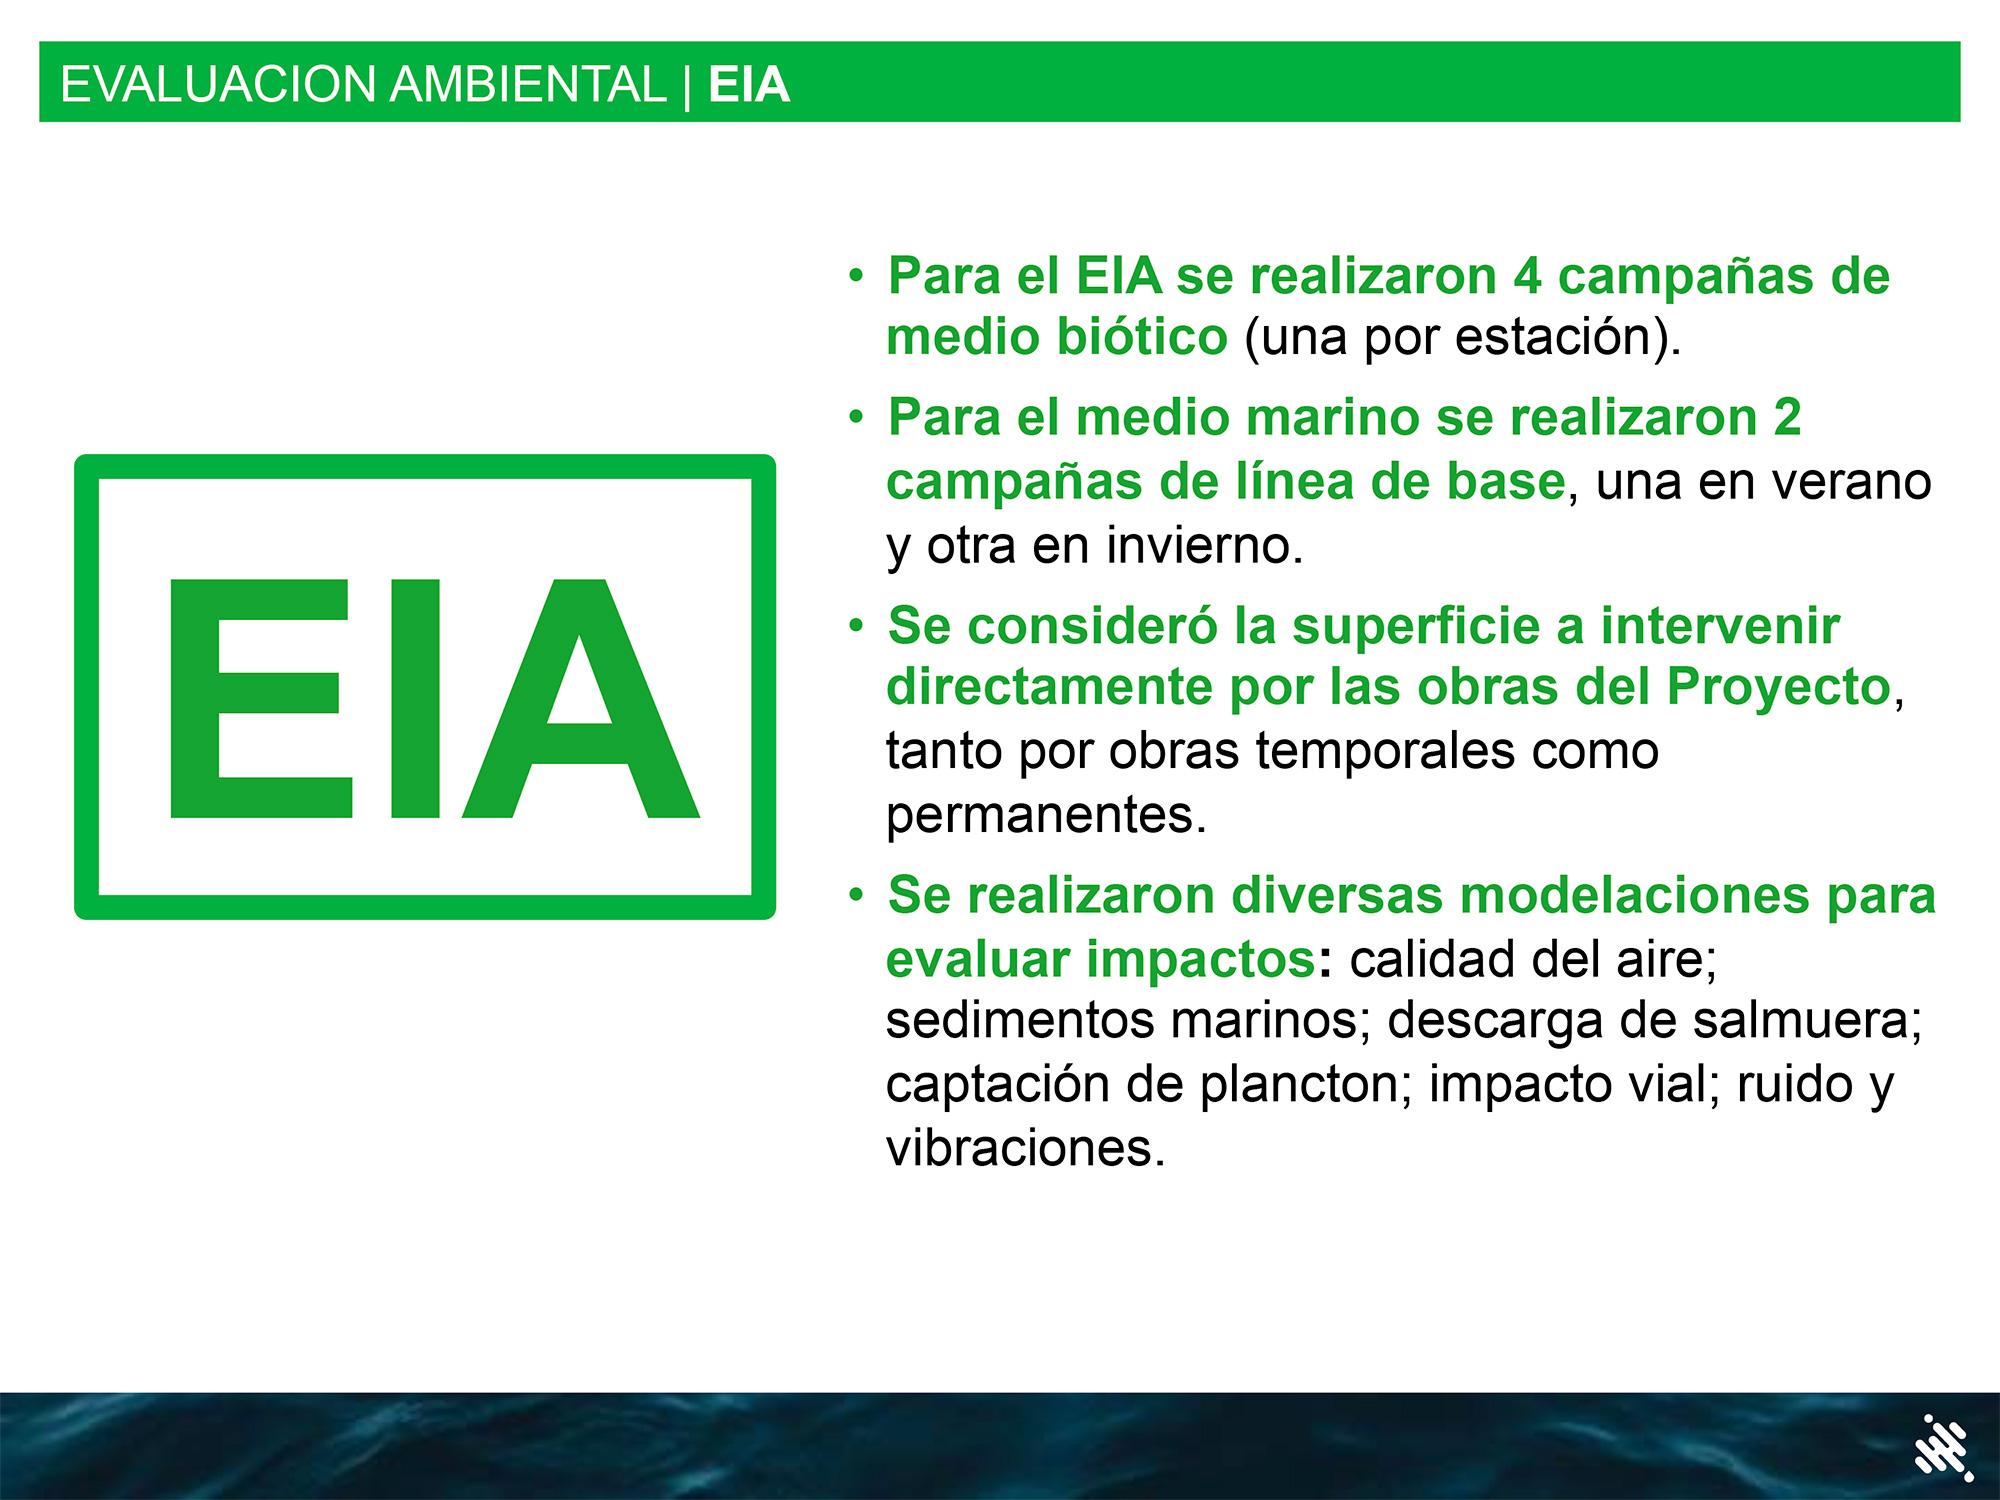 AP_Proyecto_Aconcagua-22.jpg